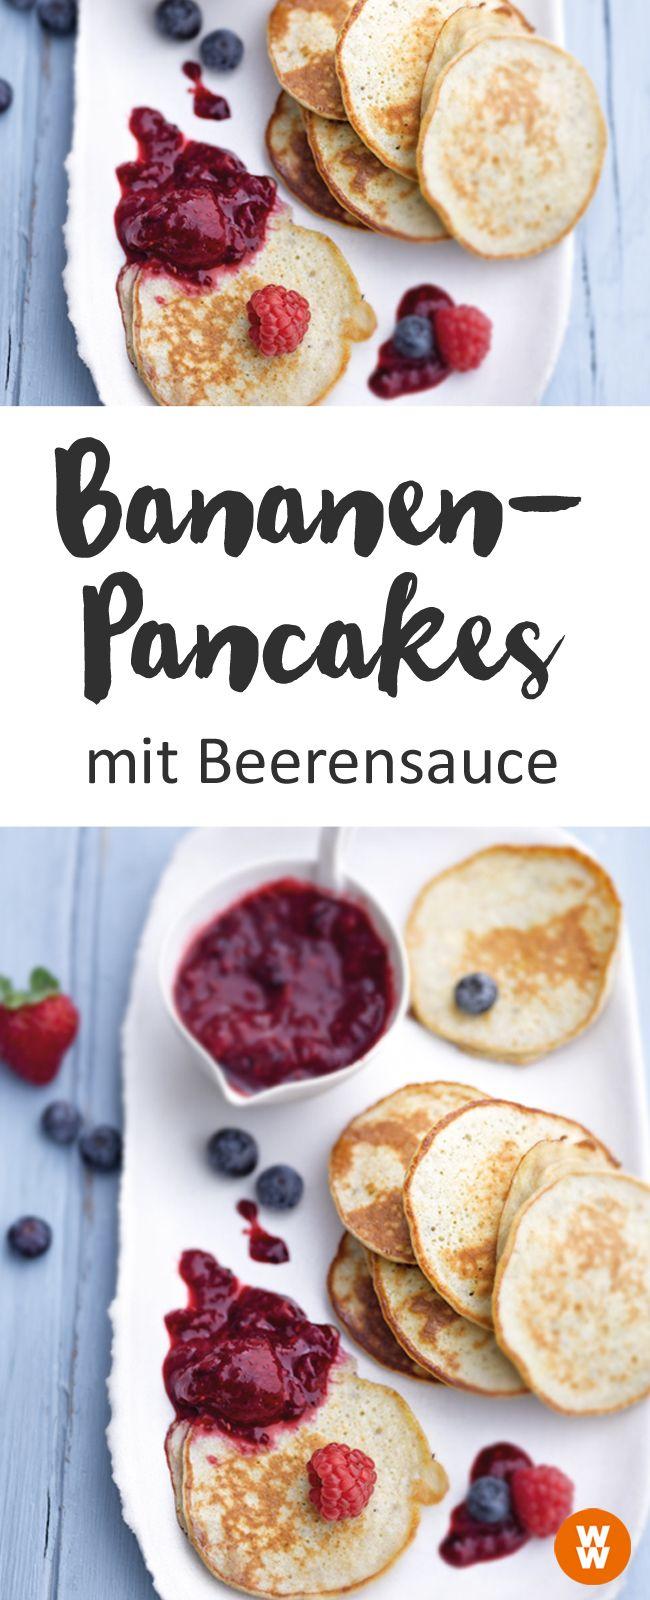 Leckeres Pancake-Rezept, Bananen-Pancakes mit Beerensauce, Pancake, Frühstück, Rezept | Weight Watchers (Pancake Healthy)